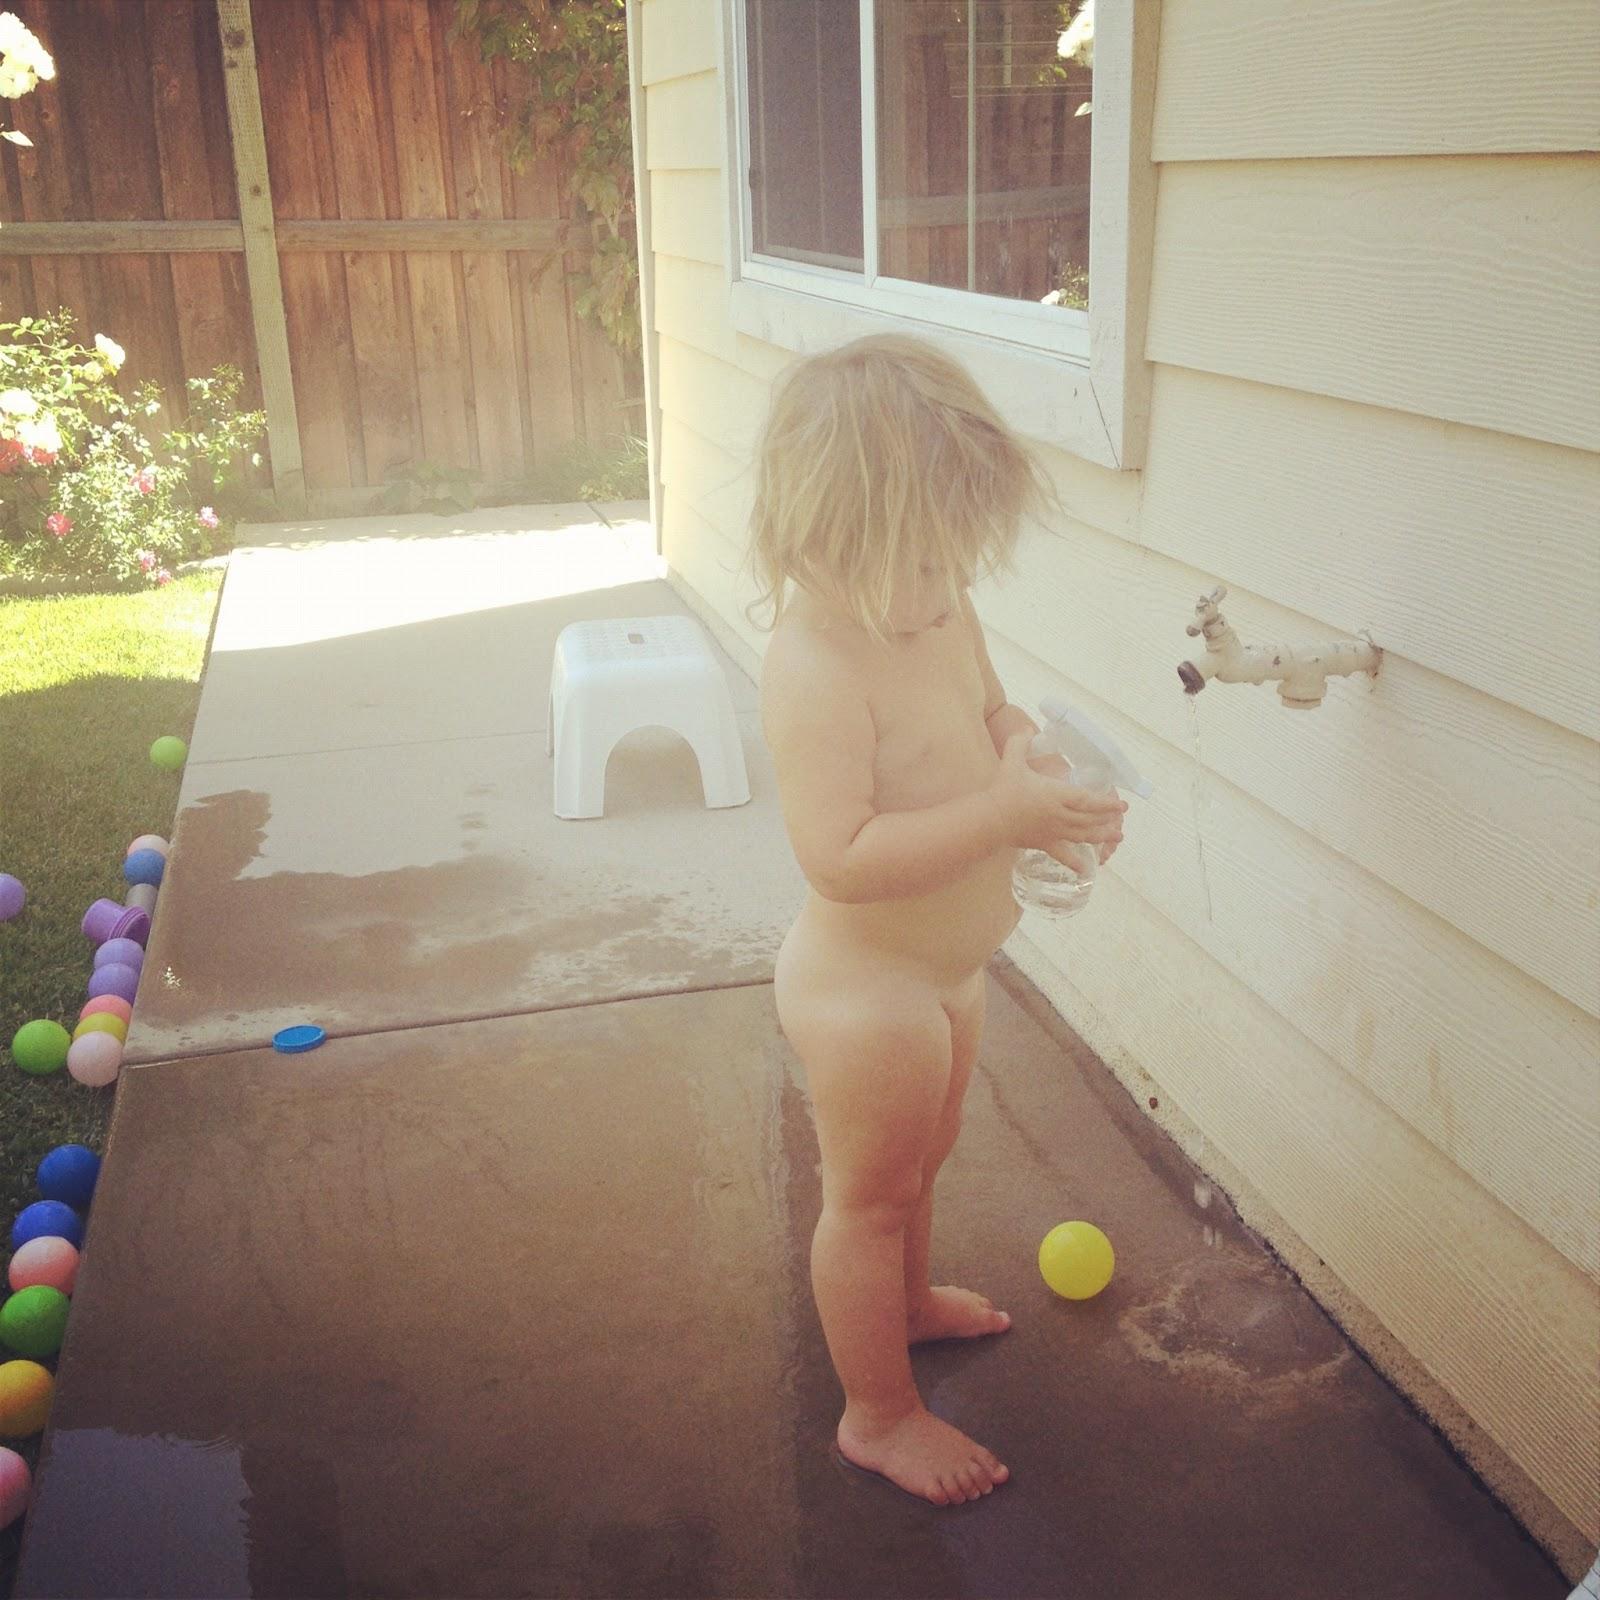 Girl Imgsrc Nude Toddler